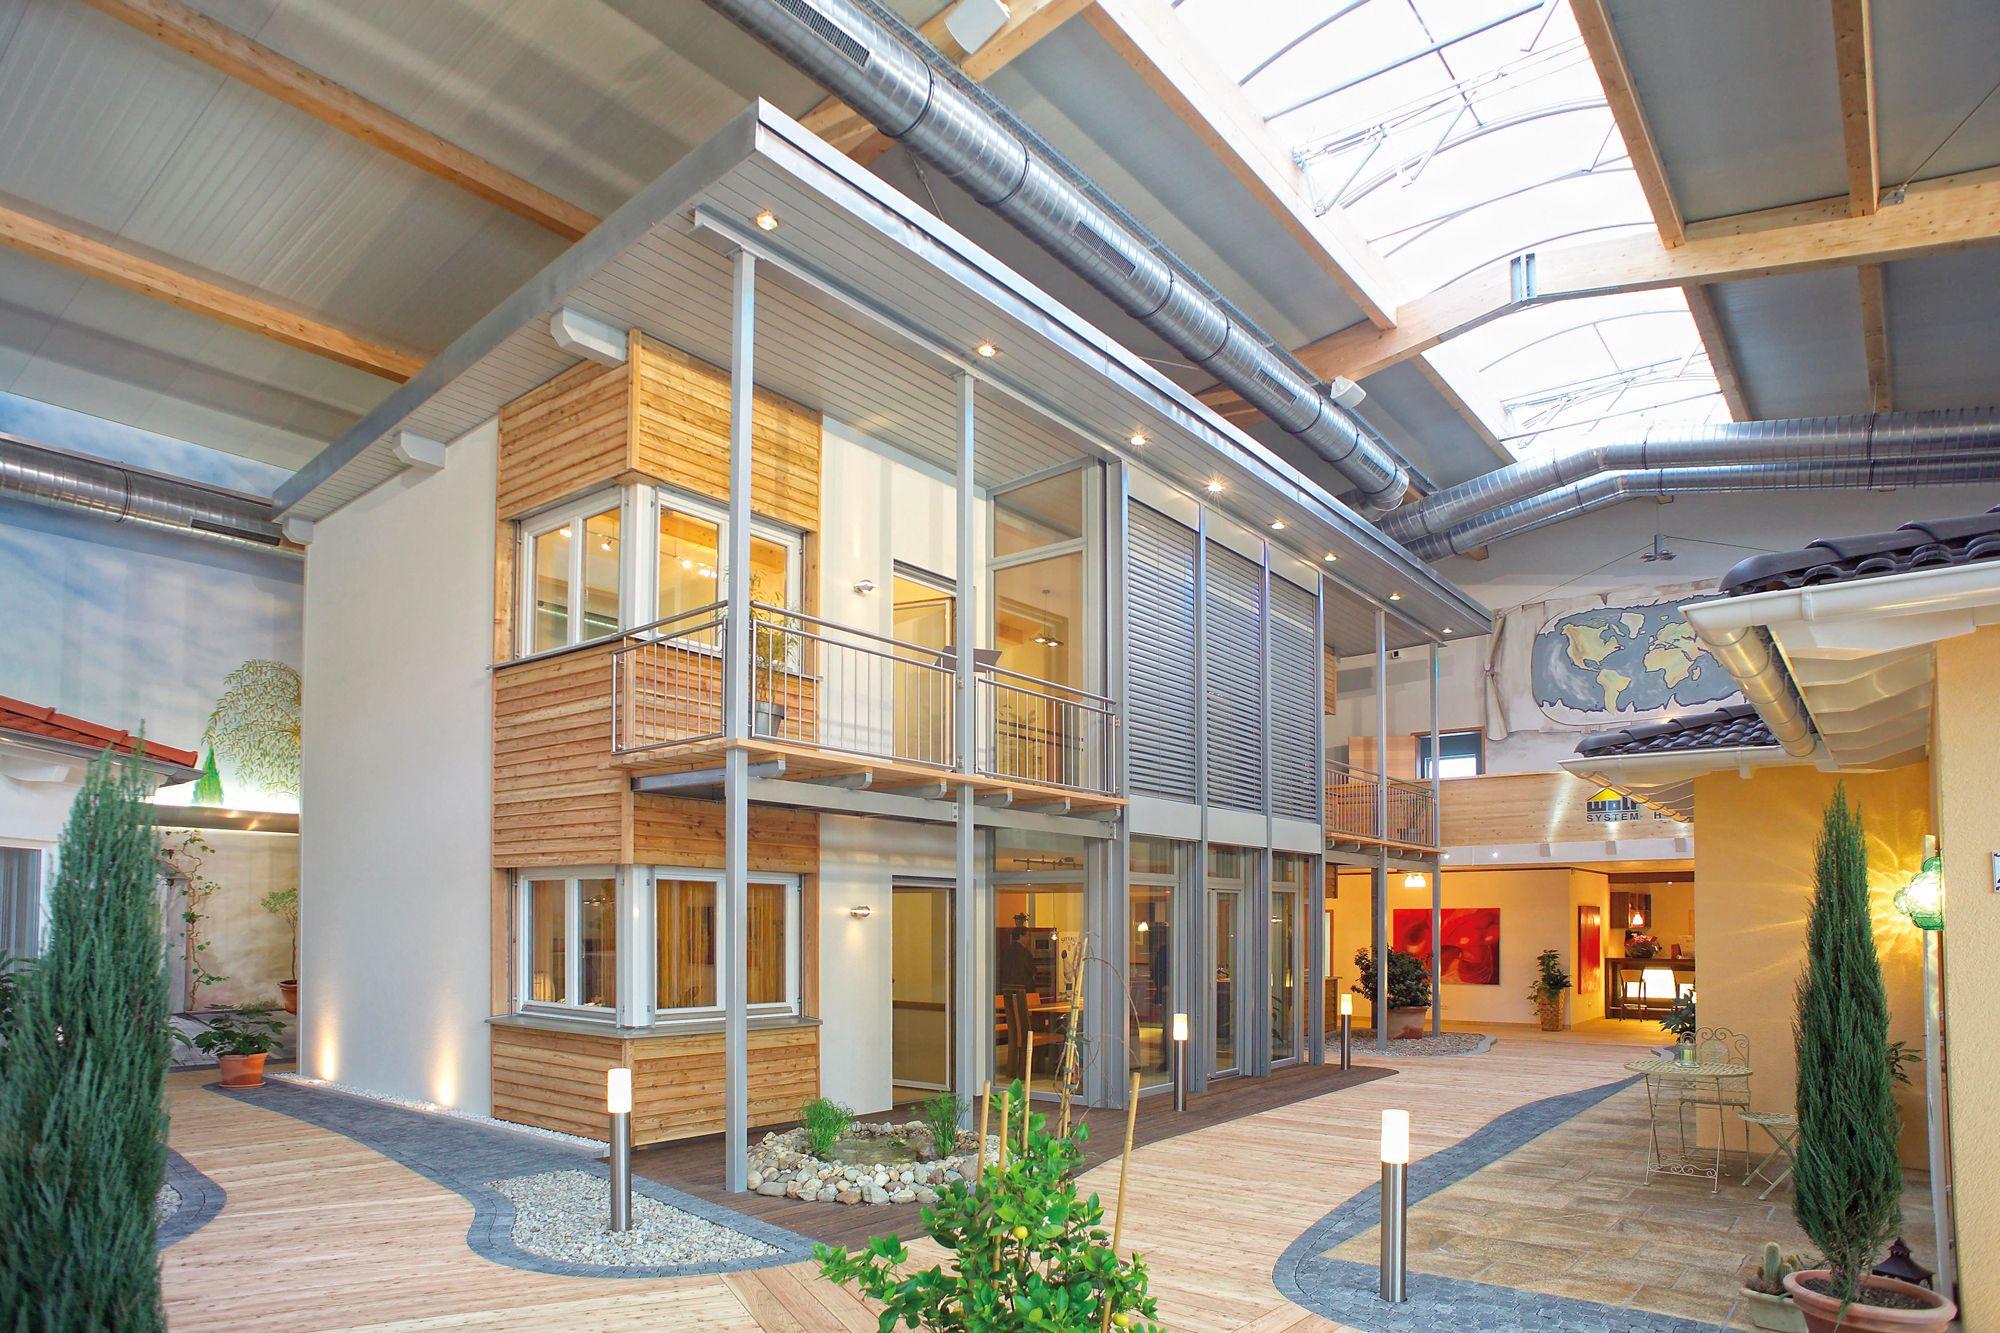 Musterhaus im WOLF Bauherrenstudio Osterhofen Haus